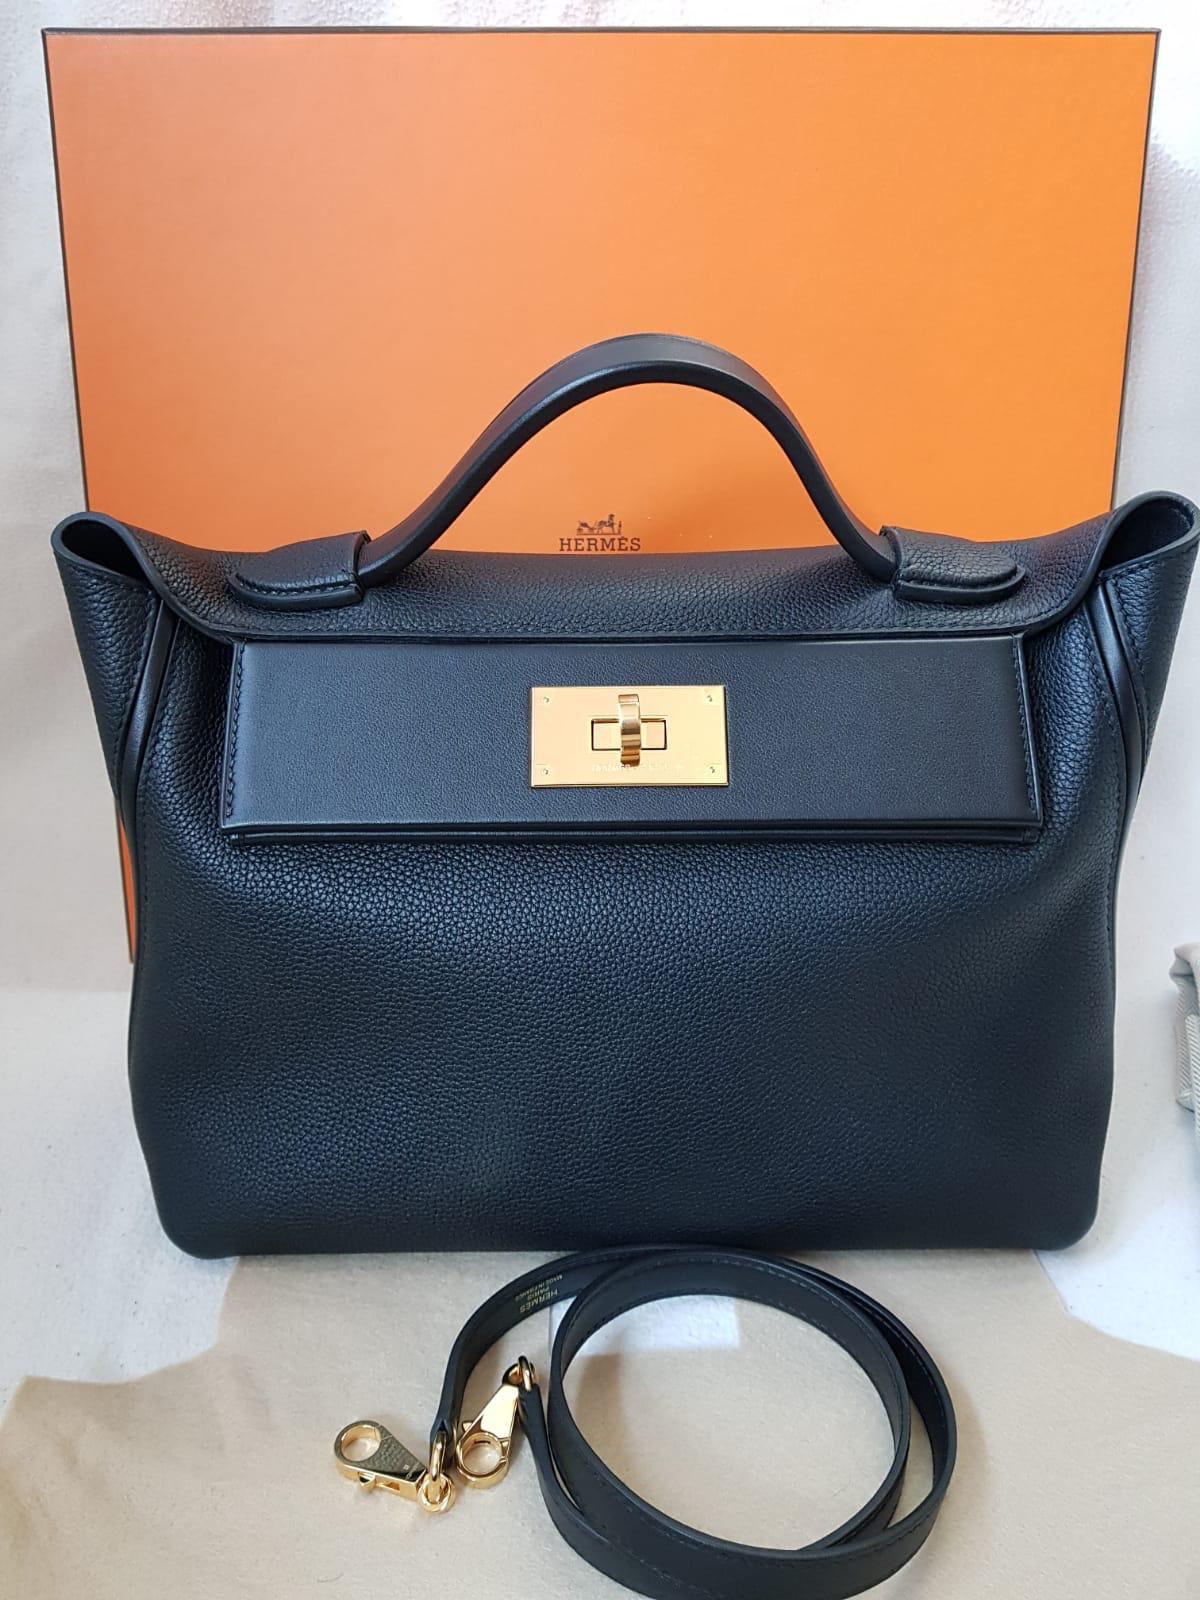 245812a52a9 ... your bag  Hermes 24 24